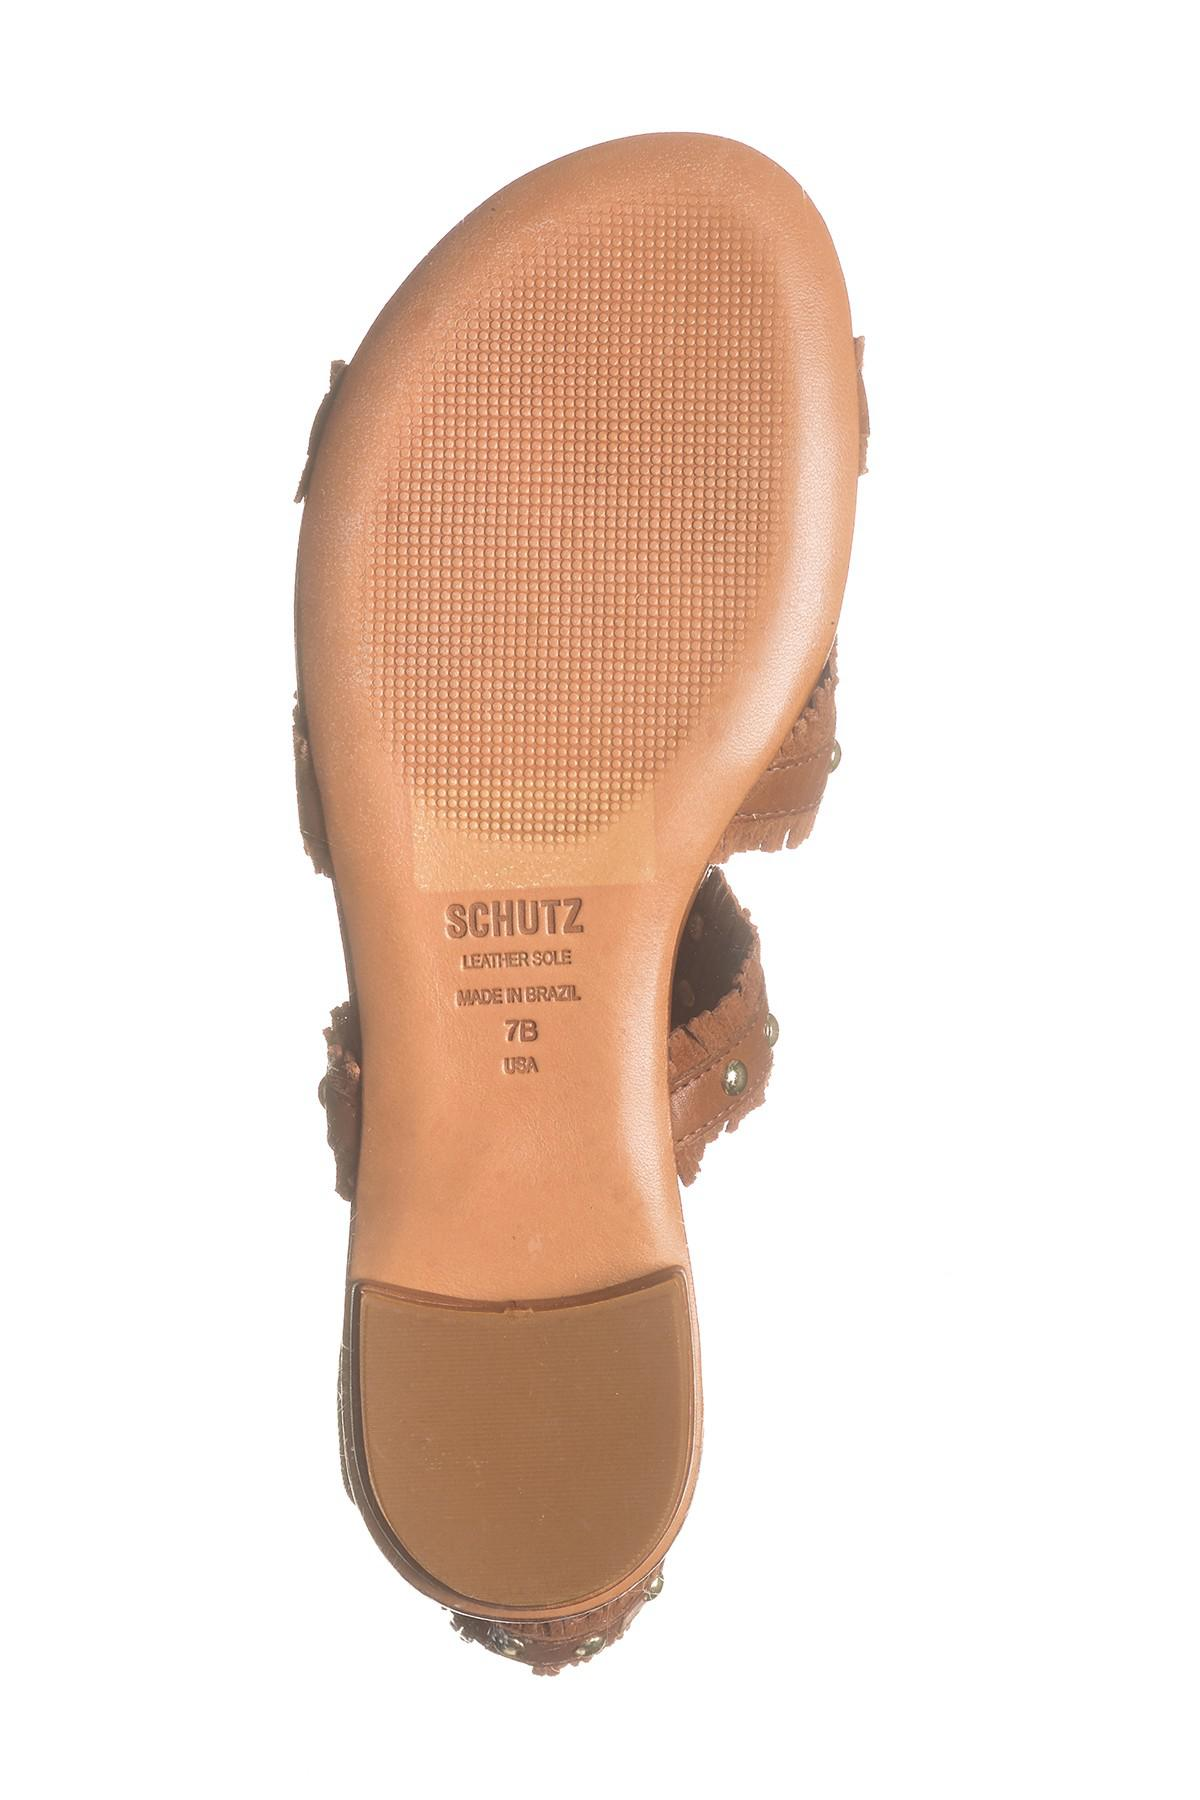 917941858539 Schutz - Brown Nayara Studded Fringe Gladiator Sandal - Lyst. View  fullscreen